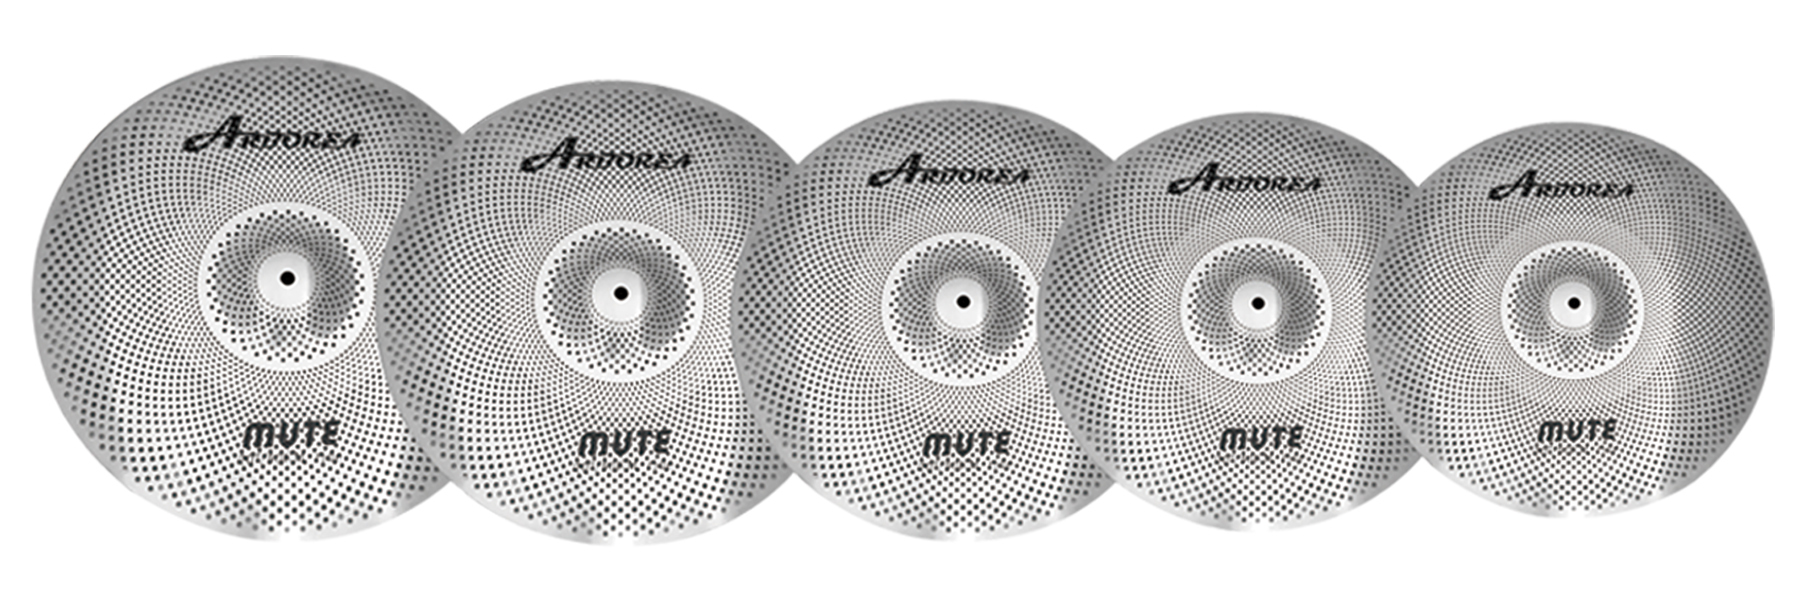 Arborea Alloy Silver Mute Cymbal Pack 14''HH + 16'' Crash + 18'' Crash +20'' Ride+Cymbals Bag